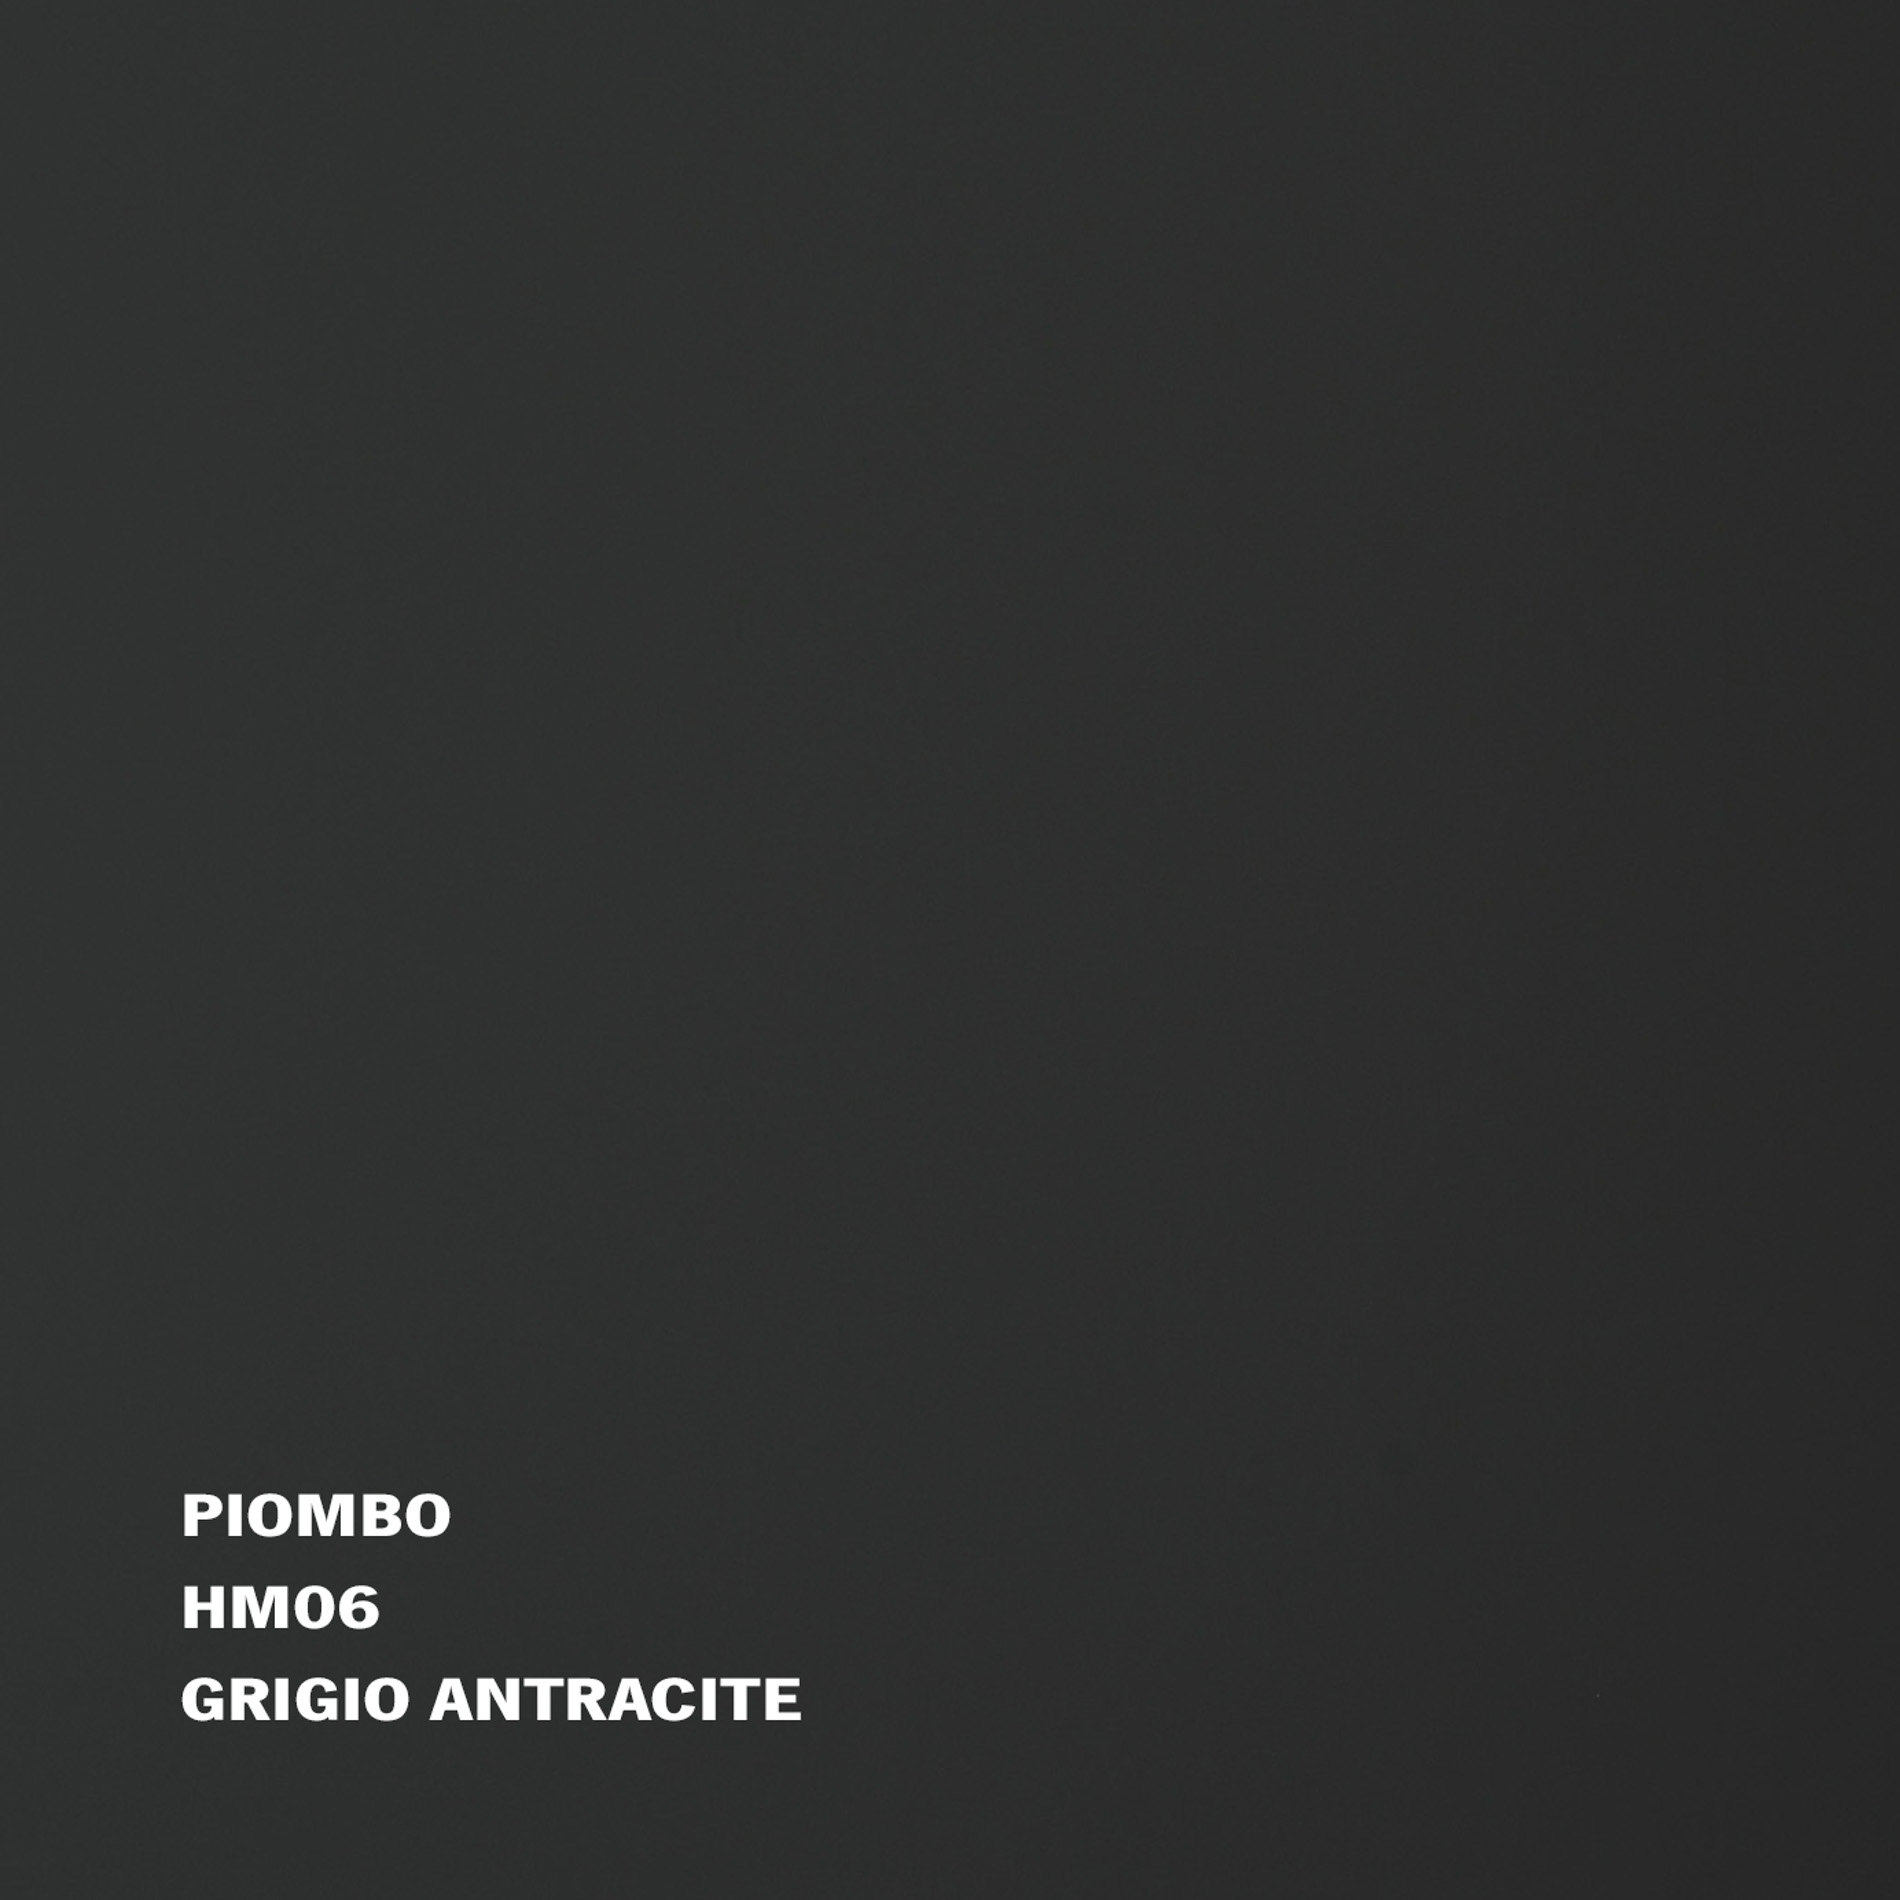 piombo_hm06